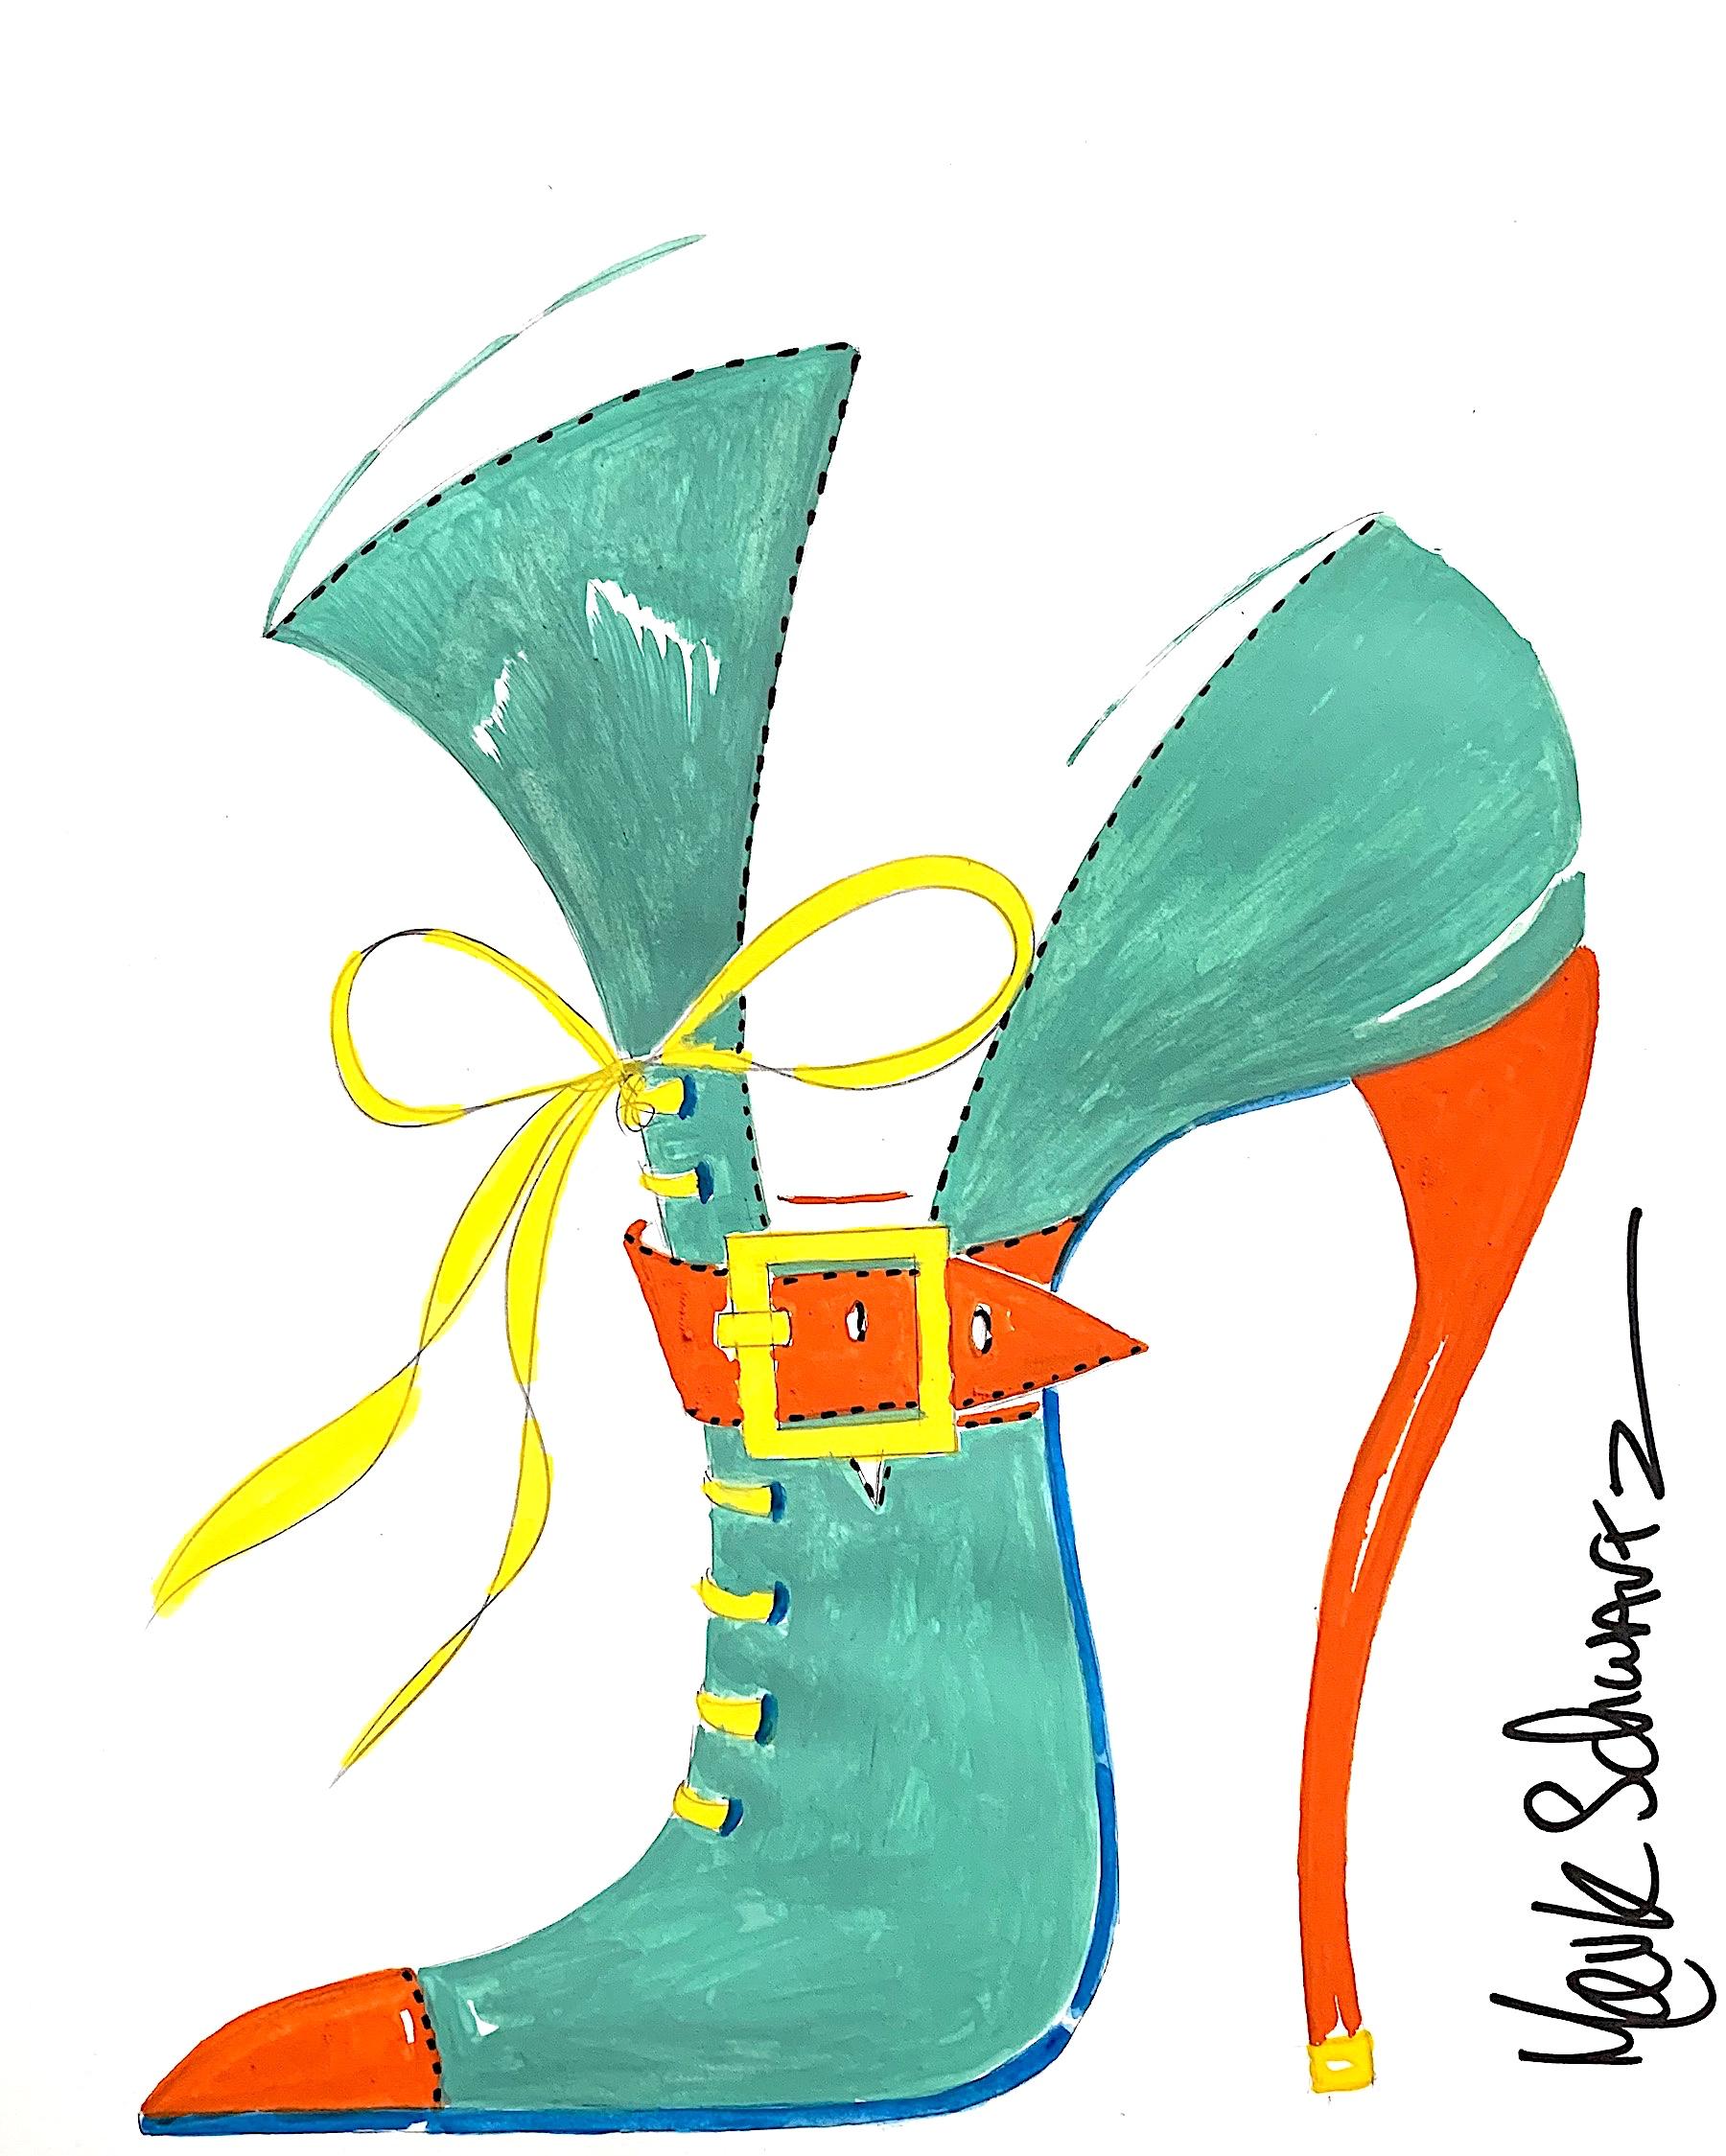 mark s shoe 2018.jpg